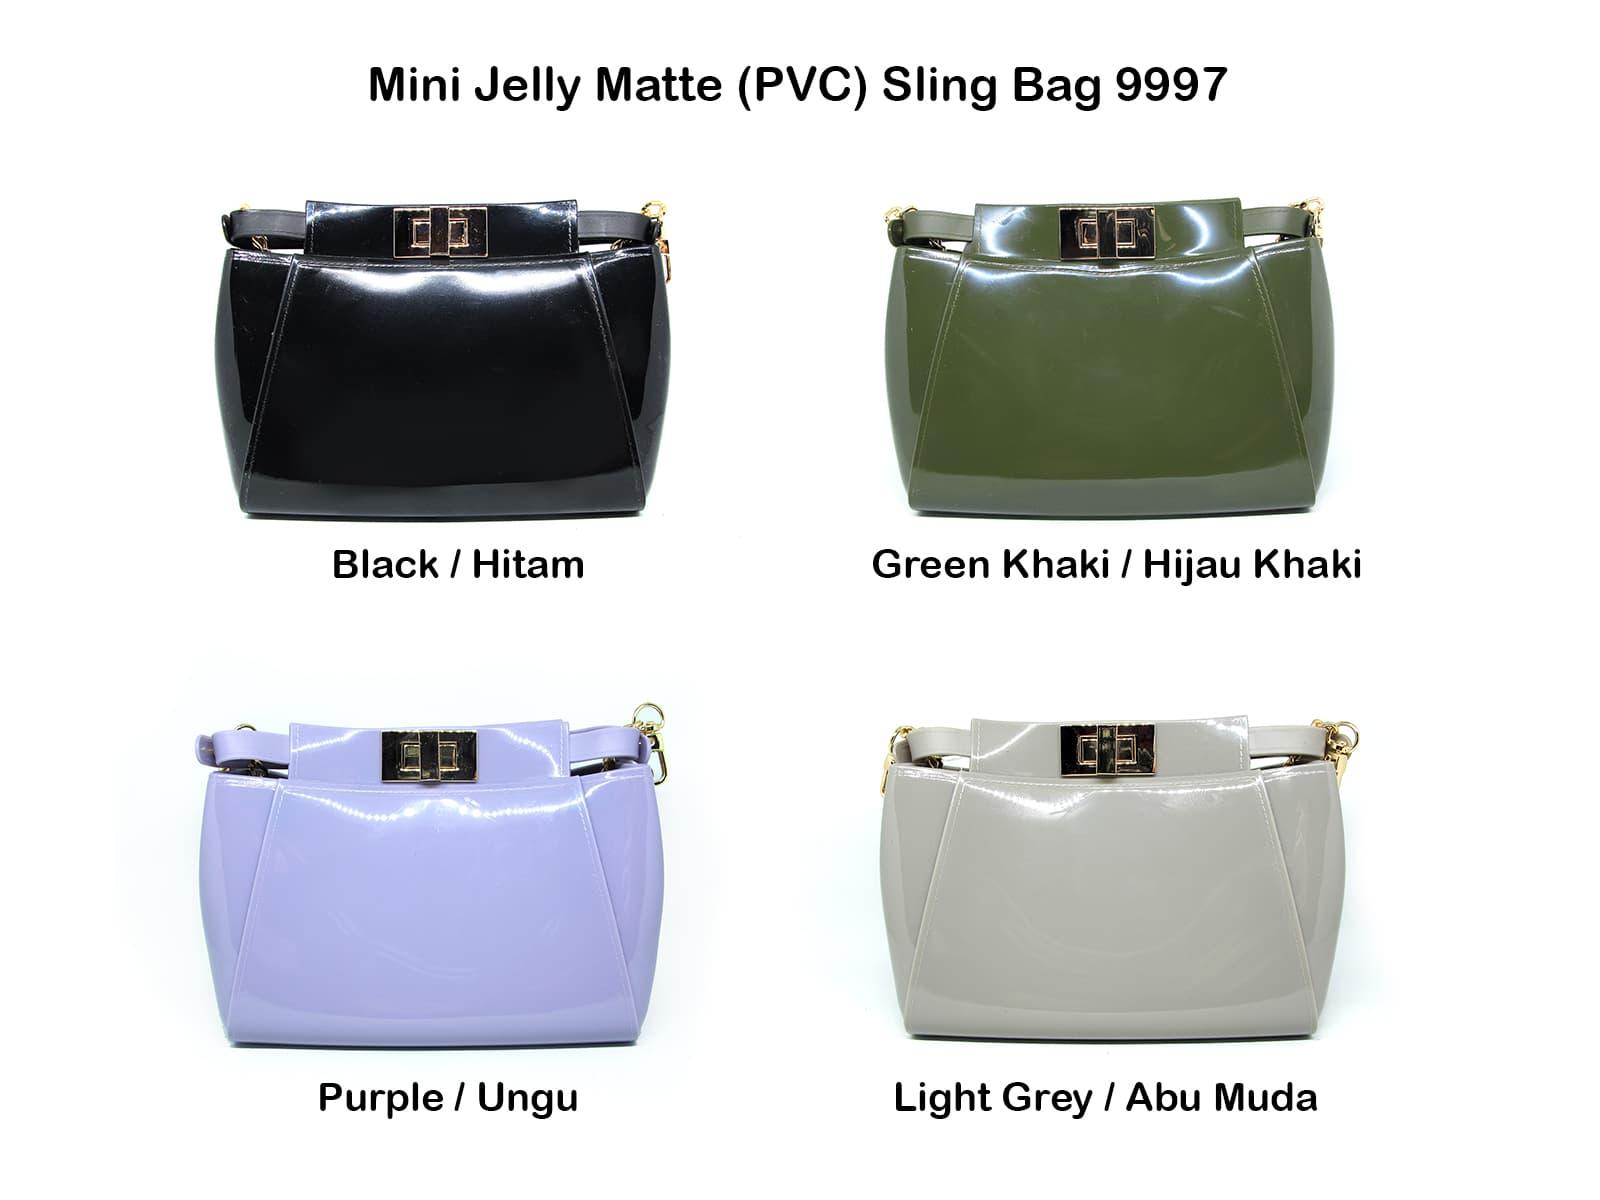 Jm9997 Tas Jelly Matte Mini 18 Cm Selempang Sling Wanita Import - Blanja .